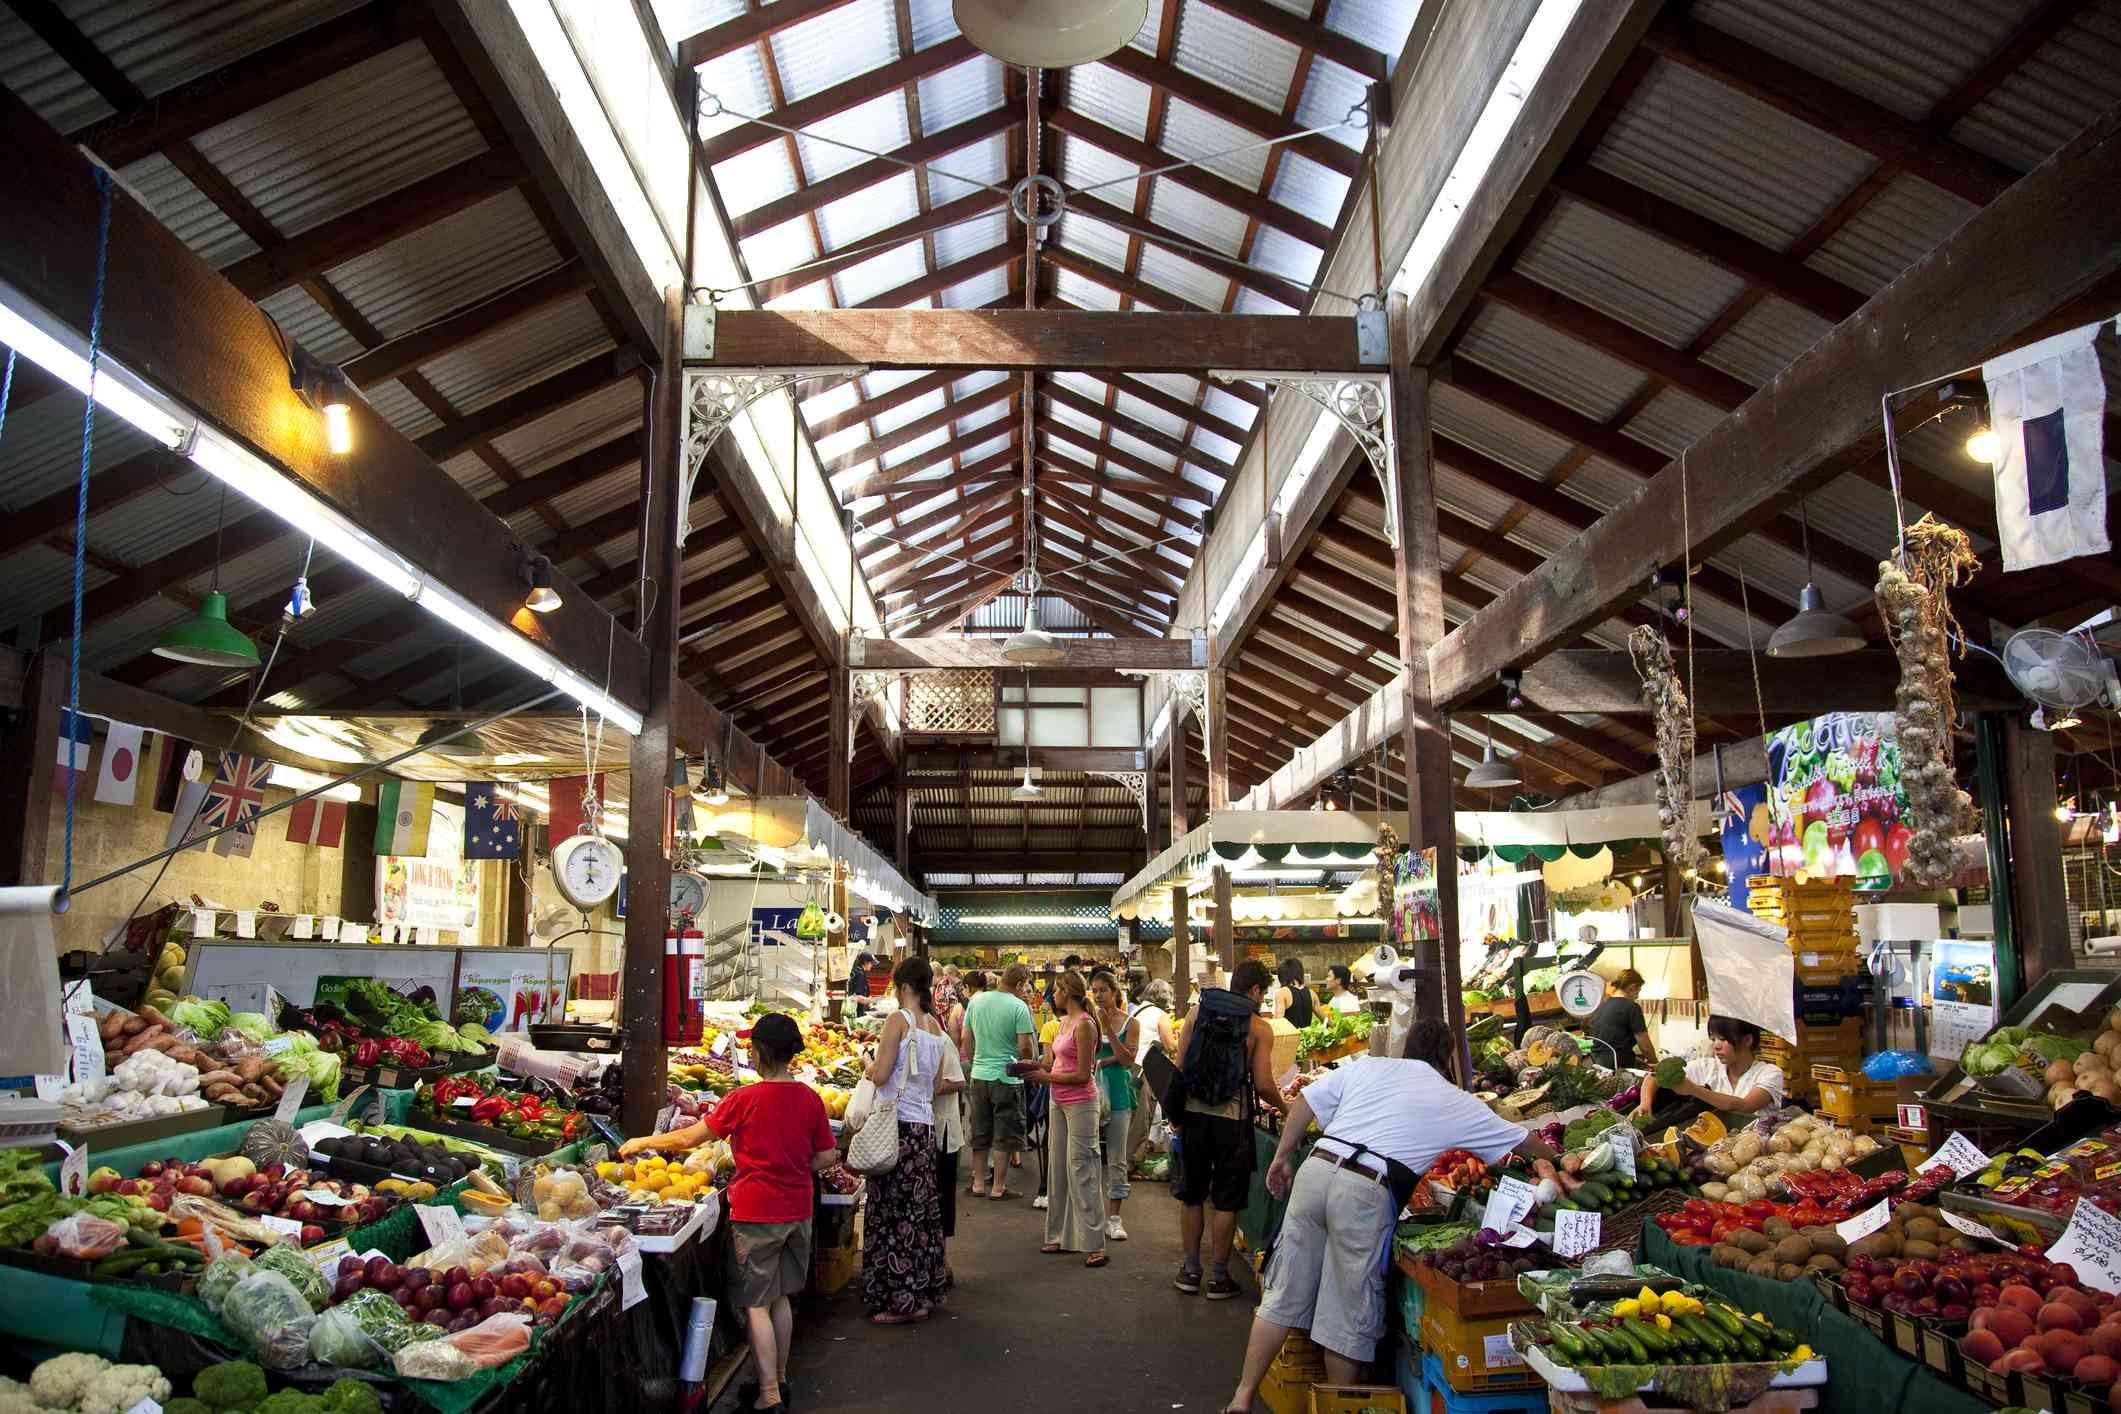 Interior of the Fremantle Markets